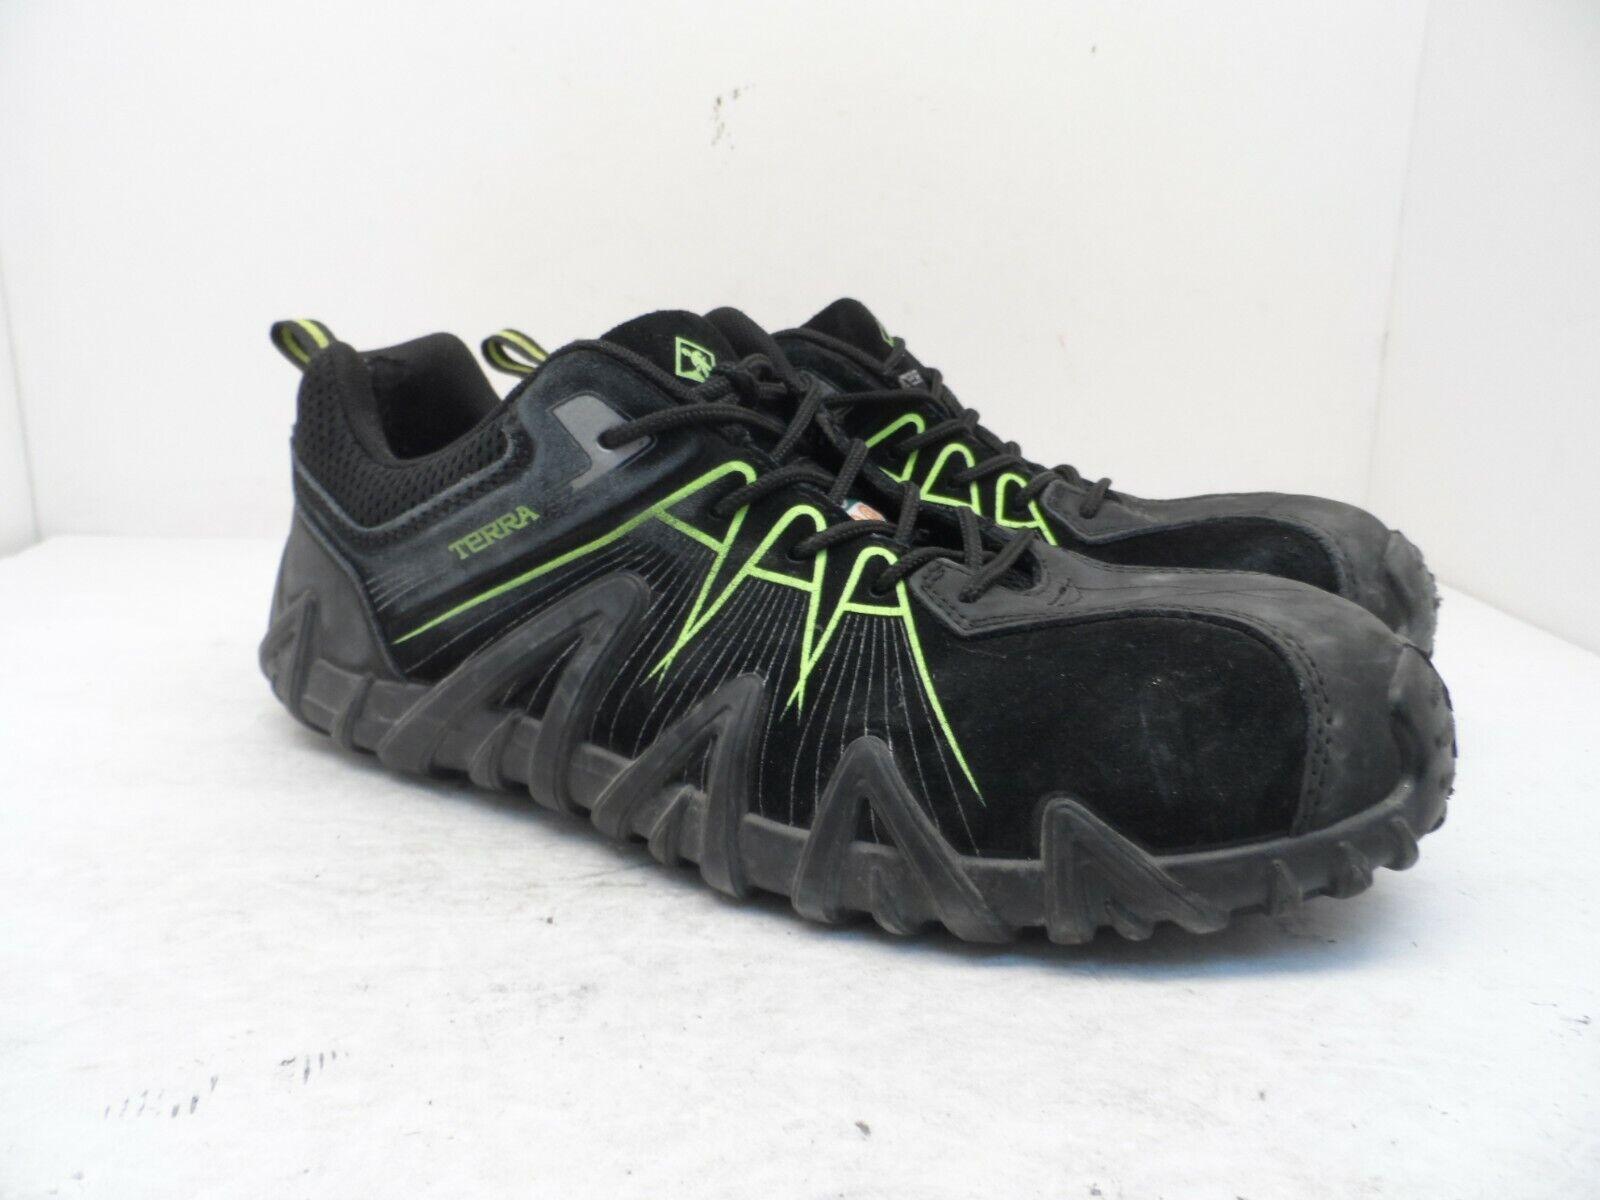 Terra Men's Spider 3.0 Composite Toe Work Shoe Black/Black/Green Size 10.5M